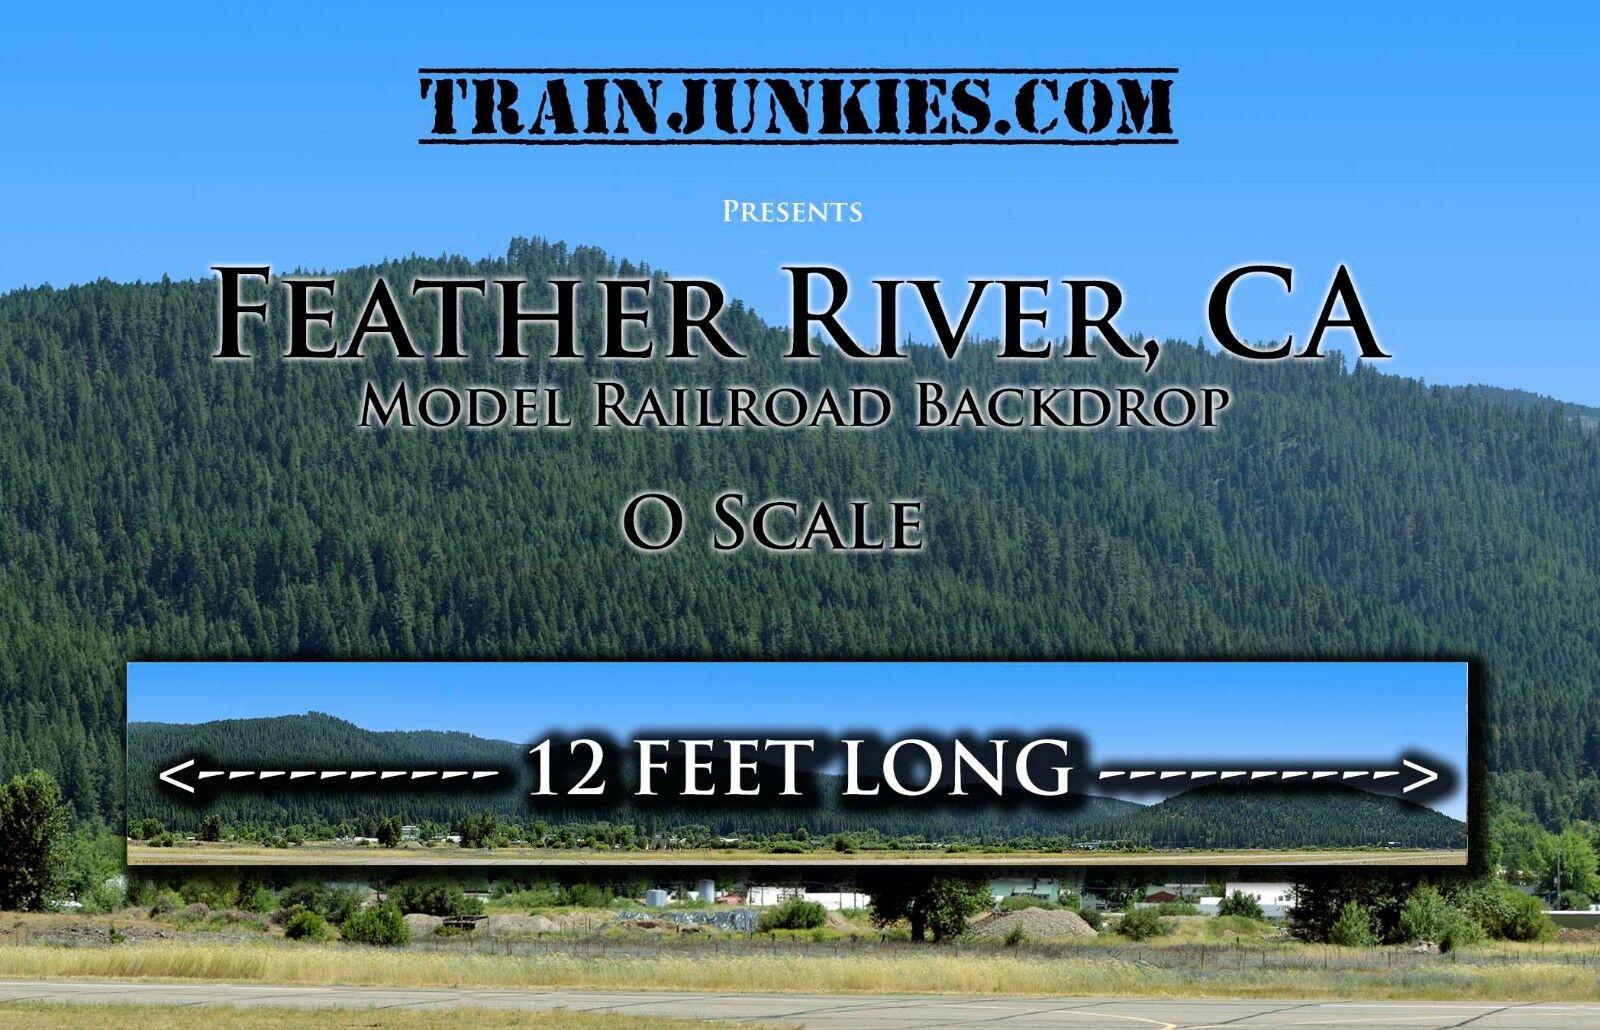 TrainJunkies O Scale Feather River Mountain modellolo Railstrada Backdrop 24x144